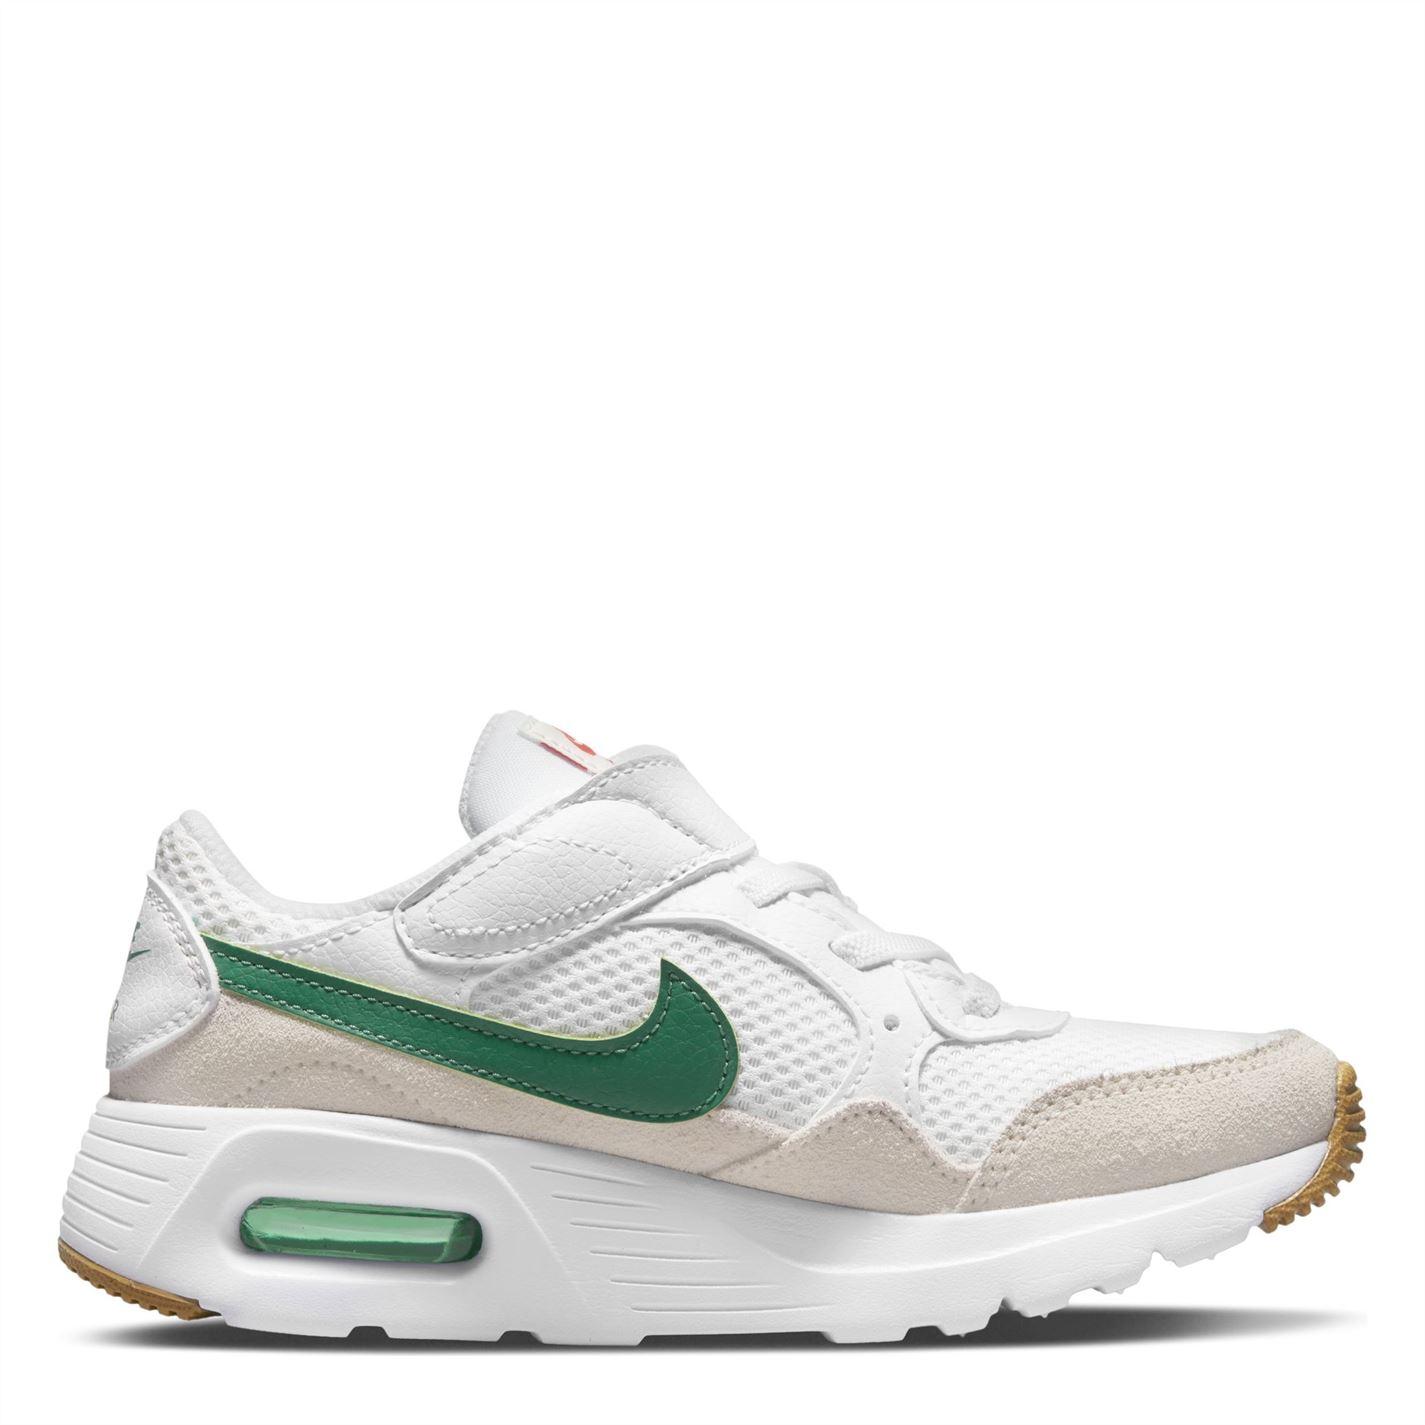 Nike Air Max SC Little Shoe pentru Copii alb verde